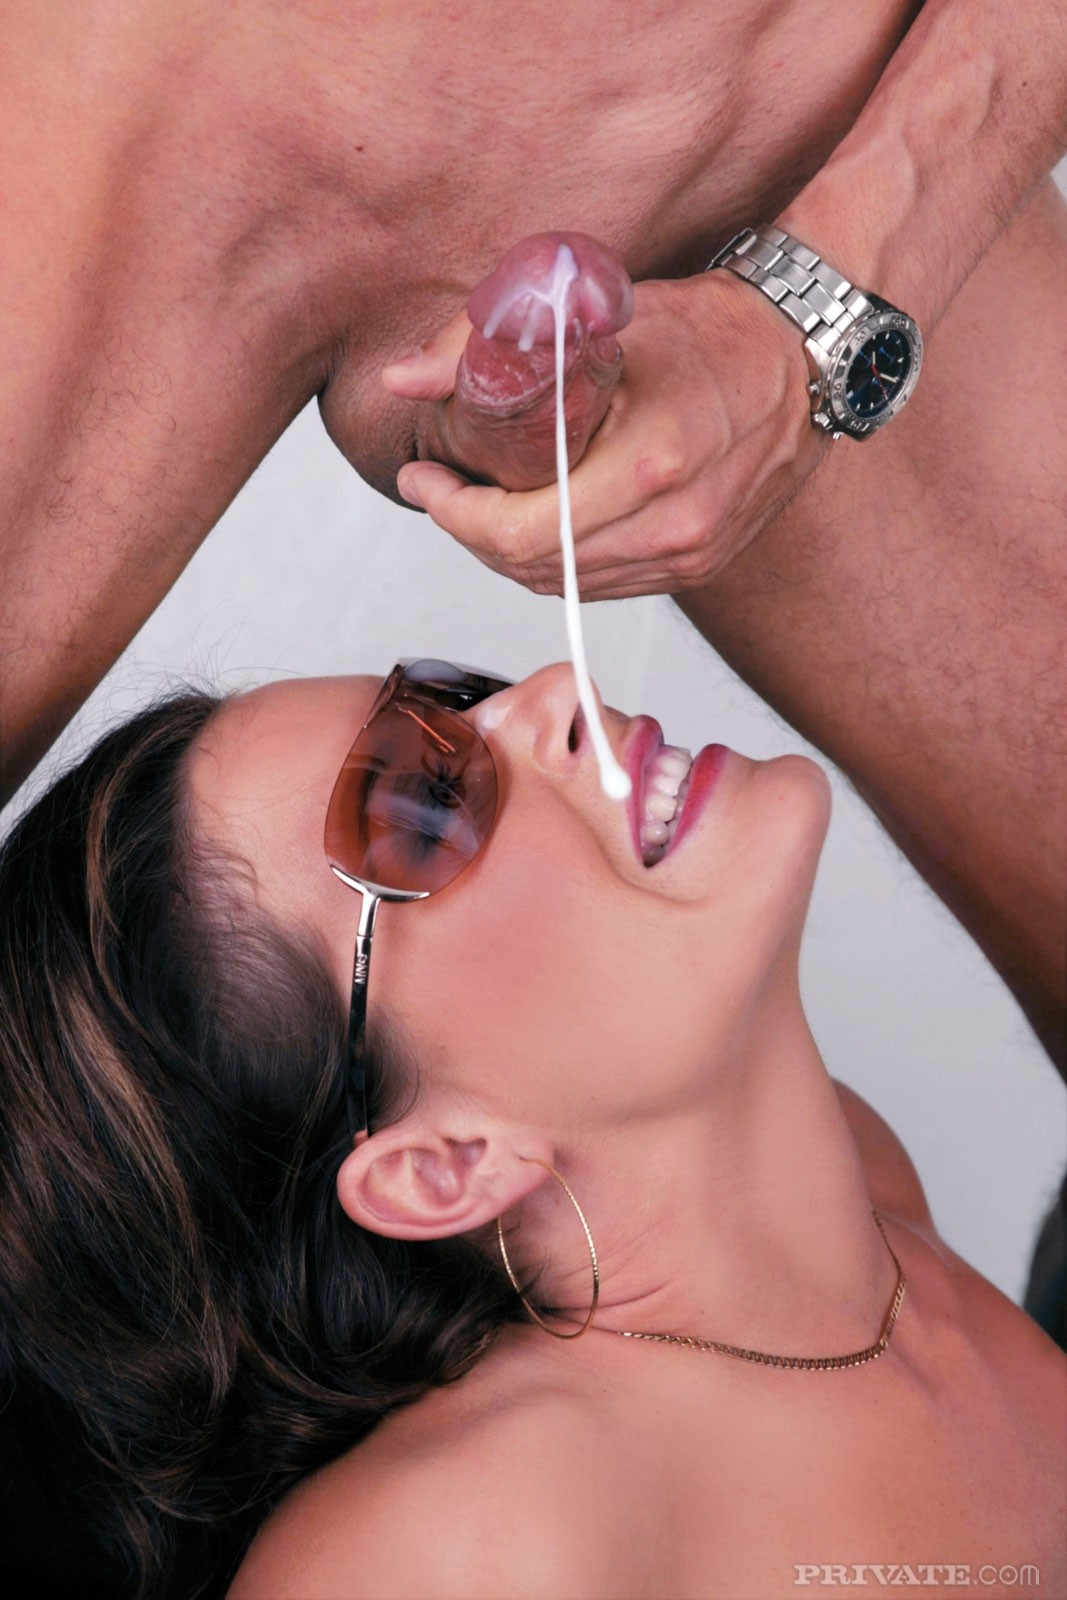 maison de fille sur fille porno – Porno